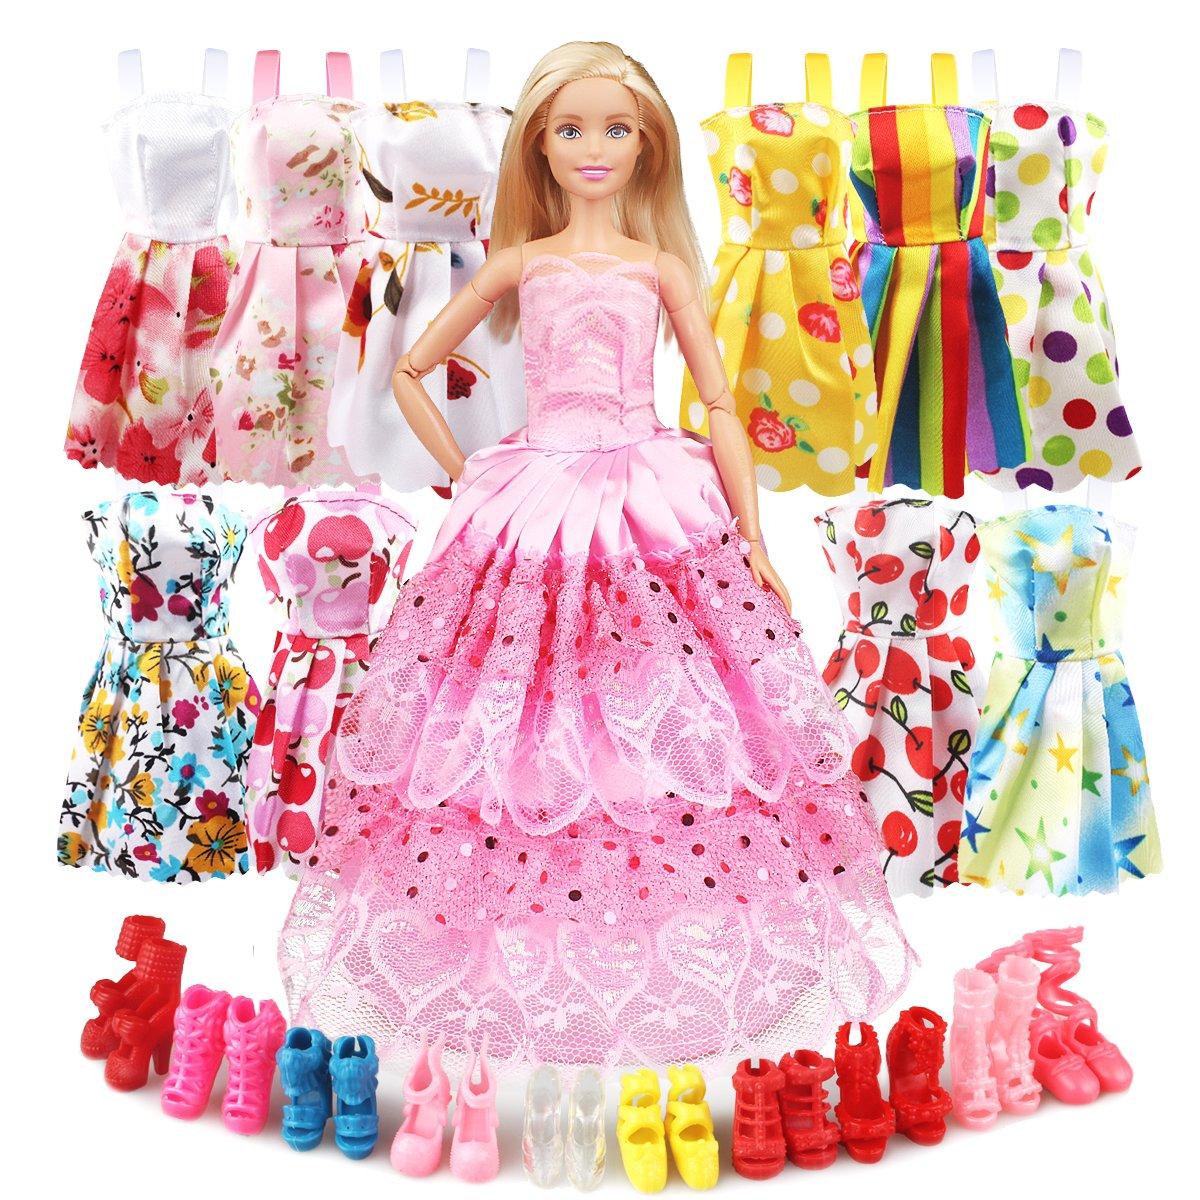 Eligara 人形用服とアクセサリー ベビー人形用服 ドレスシューズセット 10足パック 人形用パーティー衣装 裁縫ドレス1着と人形用シューズ10足 女の子の誕生日用 B07NVL1TMM